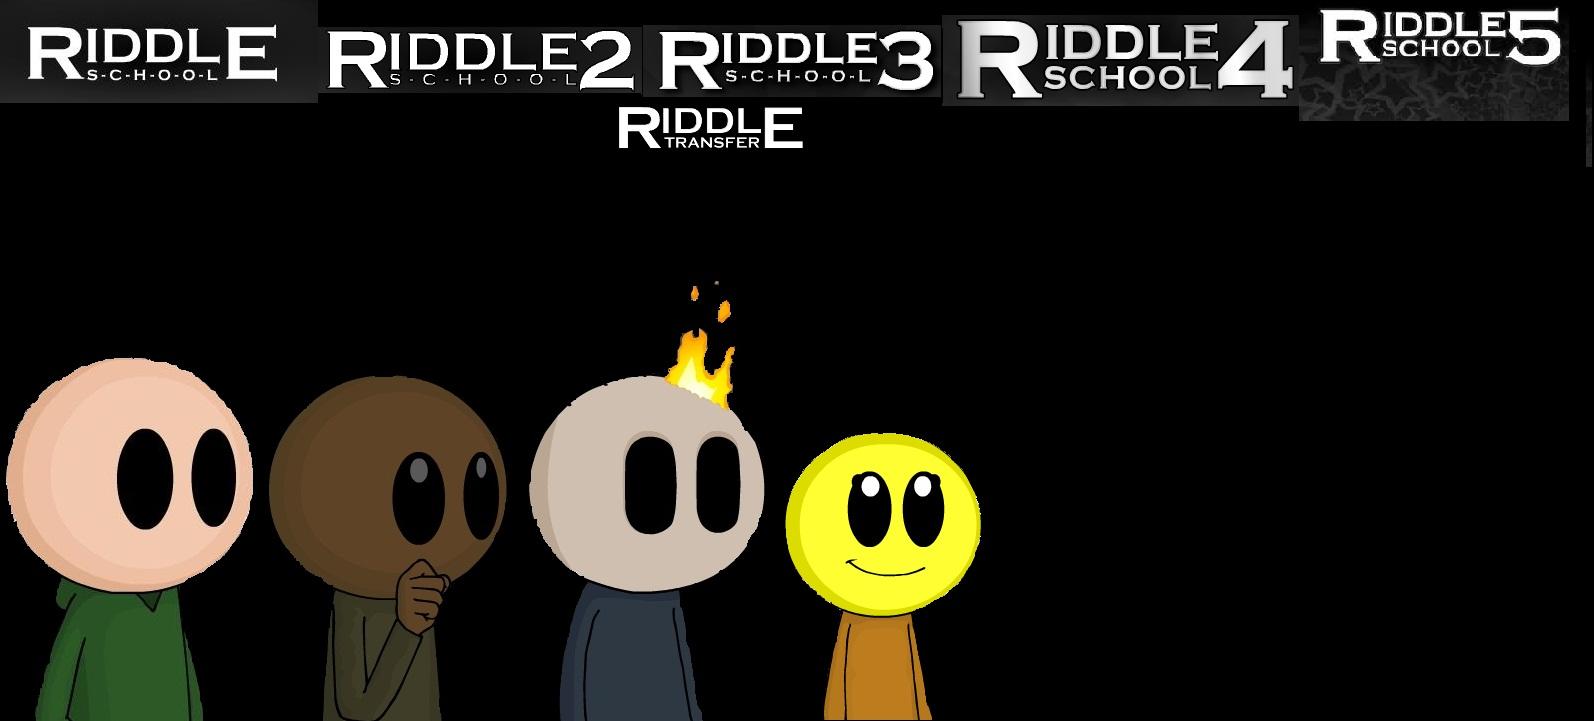 Google chrome theme infinite -  Riddle School Google Chrome Theme By Ellescarlet